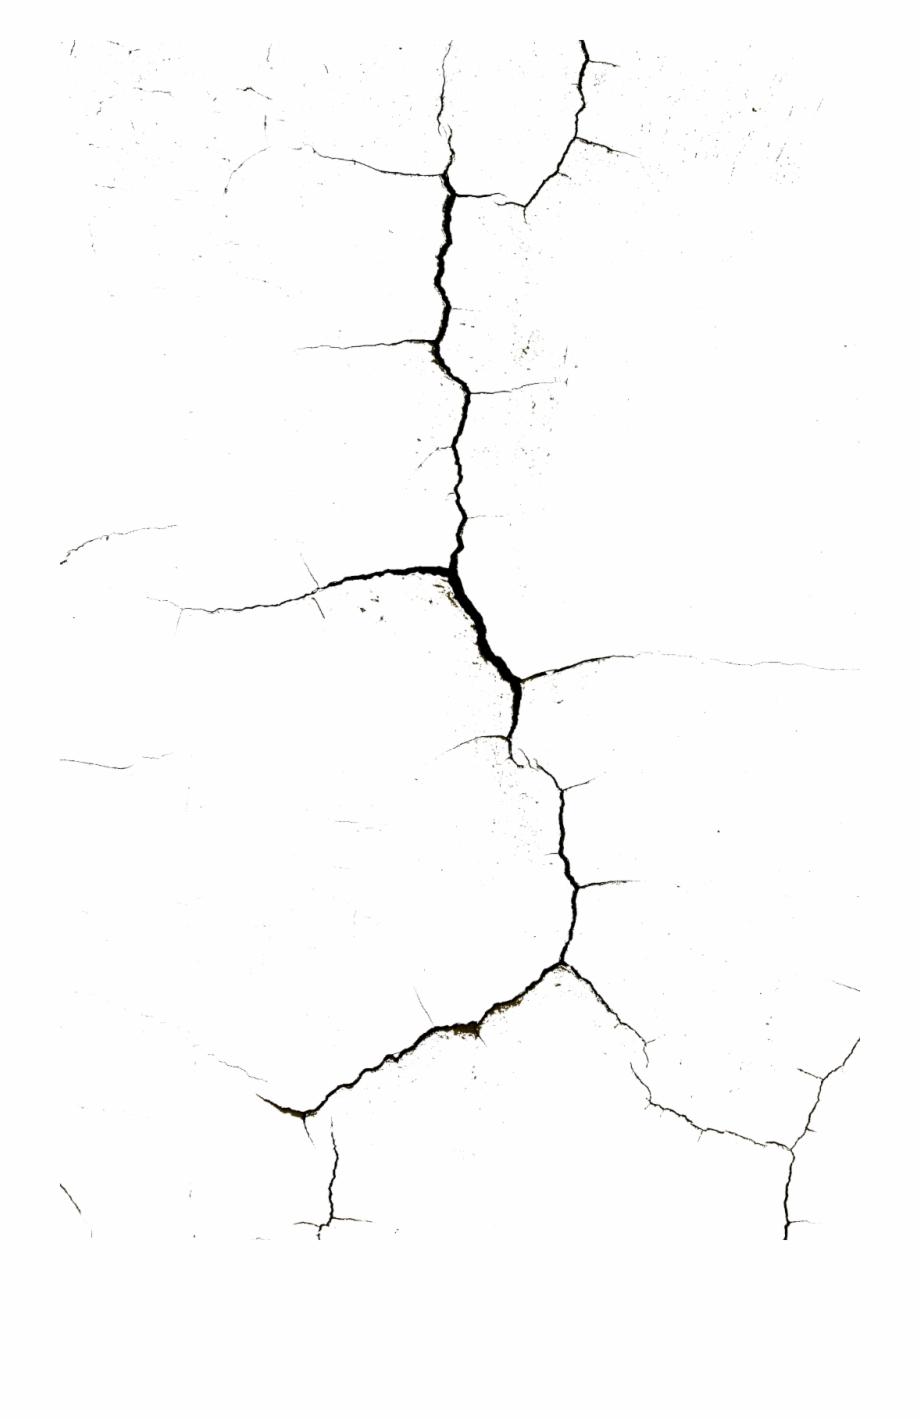 cracked #cracks #ground #road #earthquake #broken.